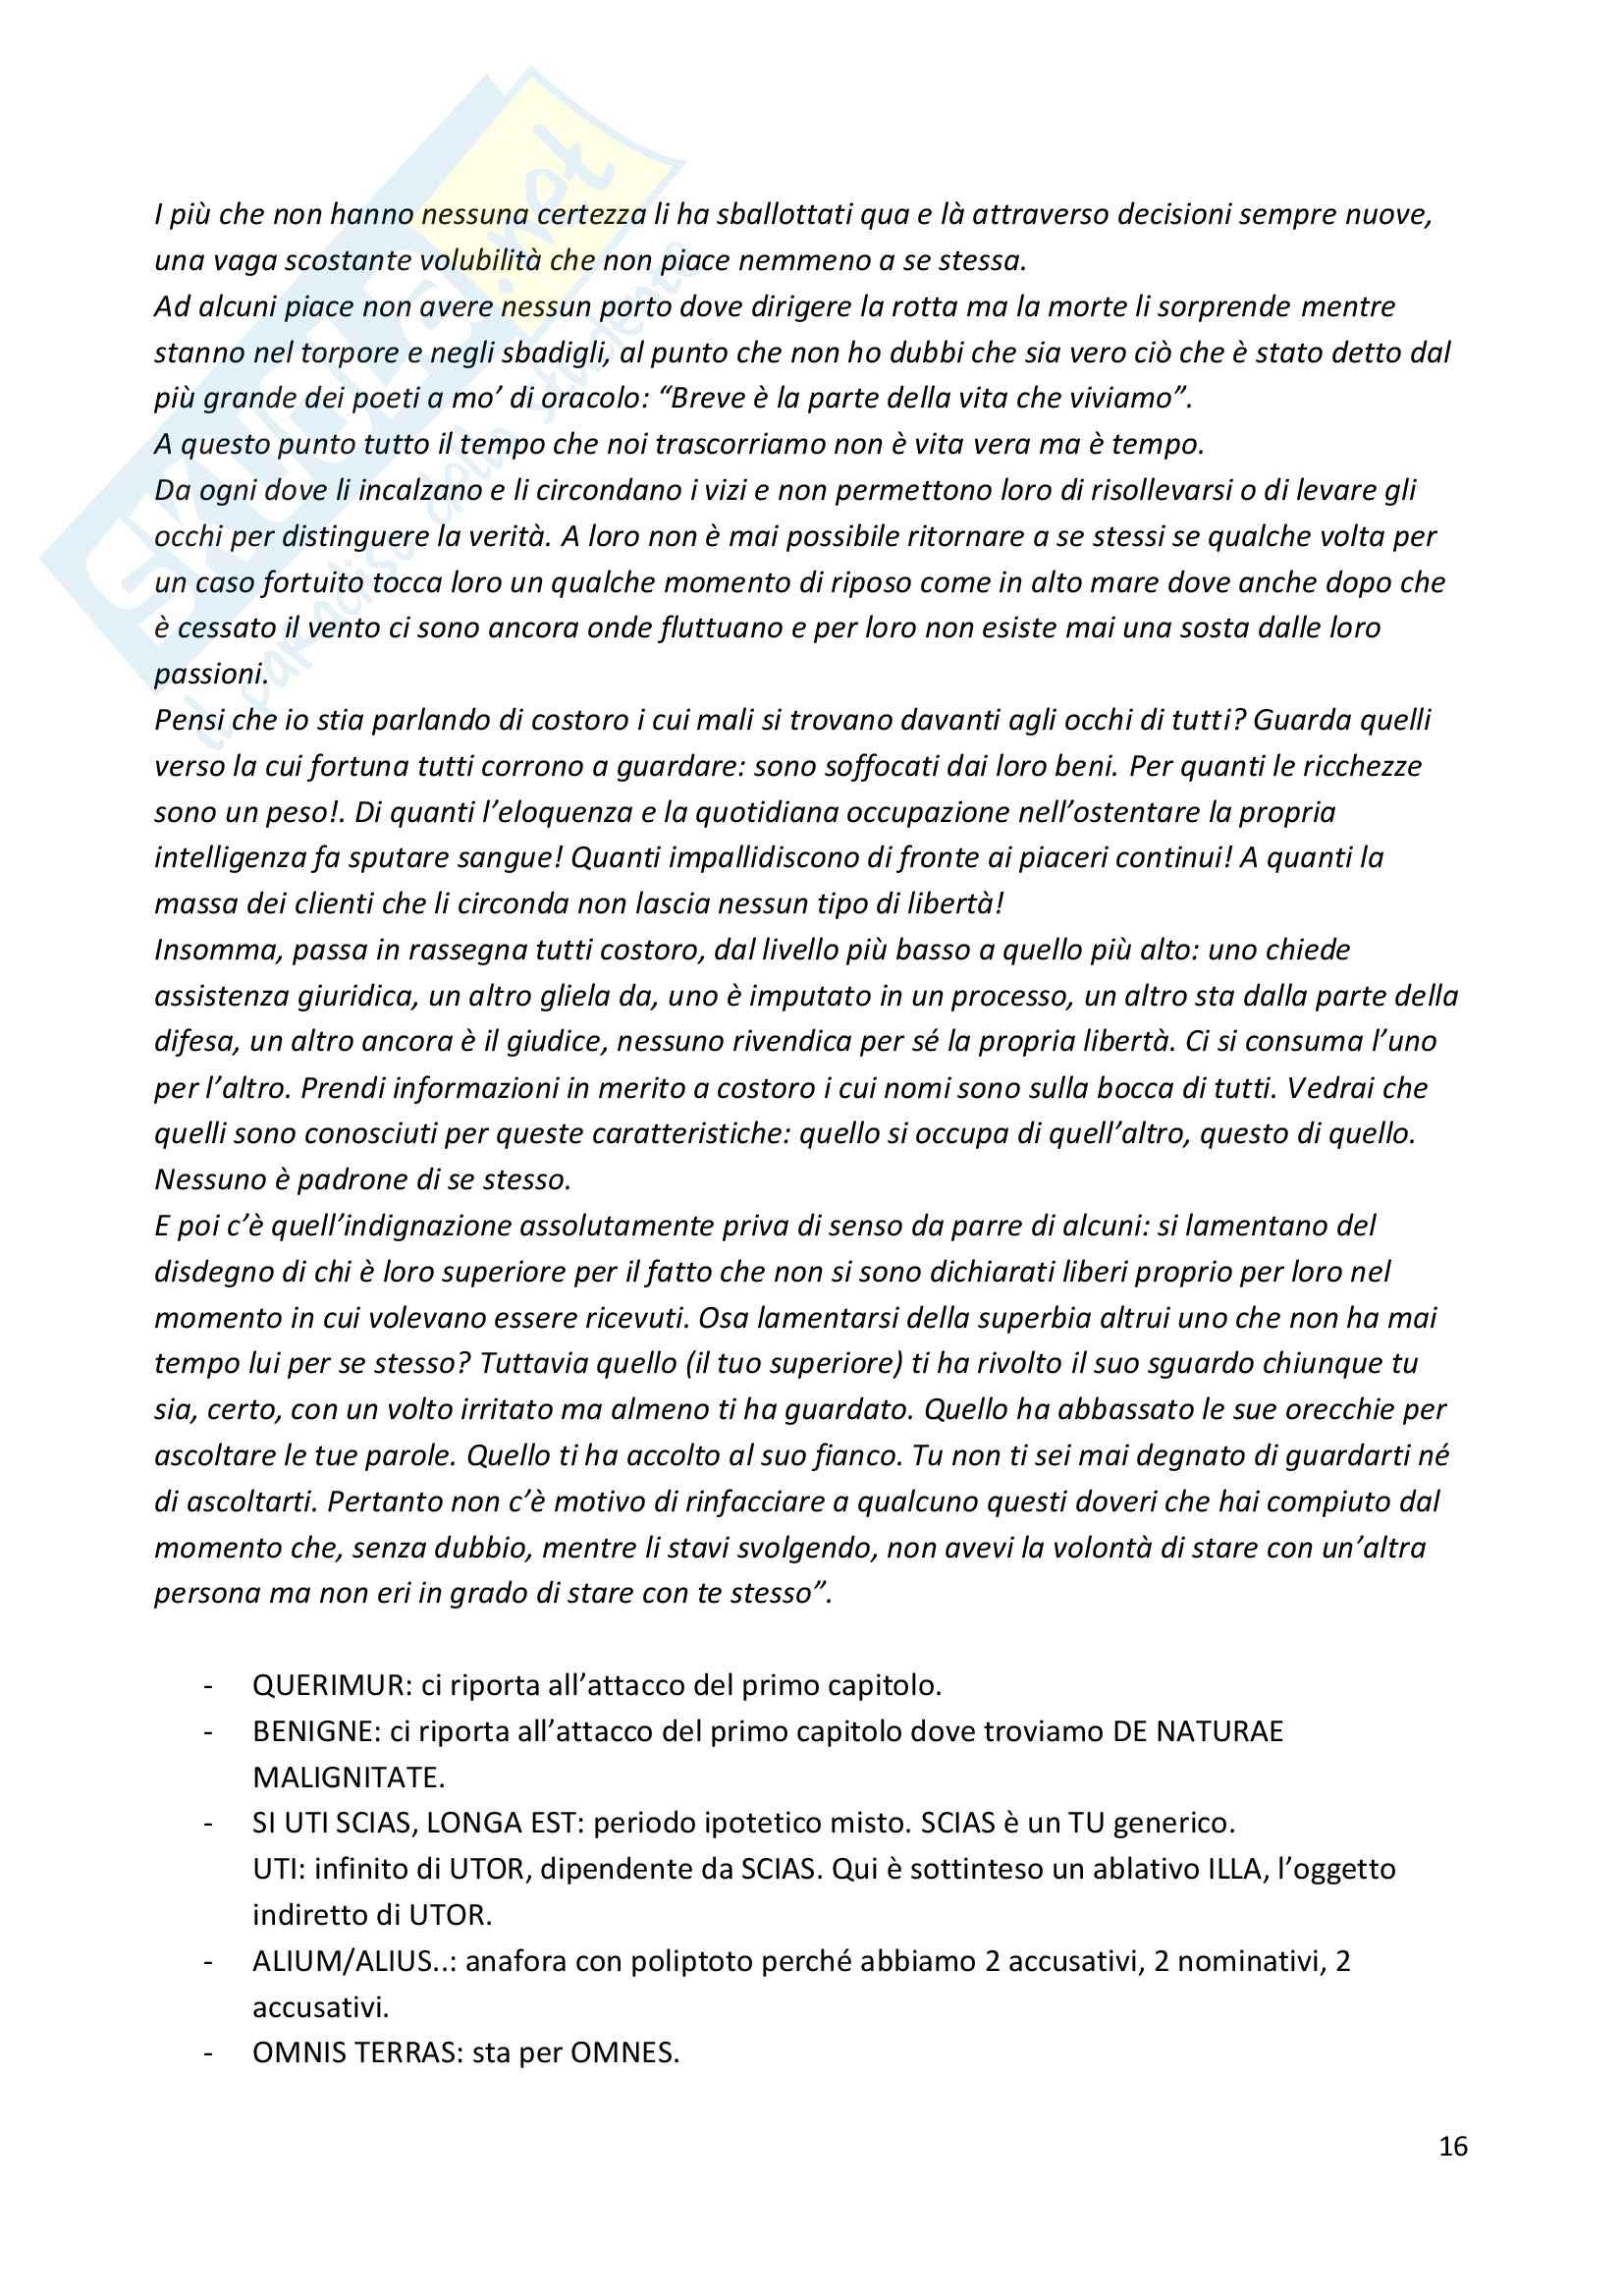 Seneca De brevitate vitae Pag. 16